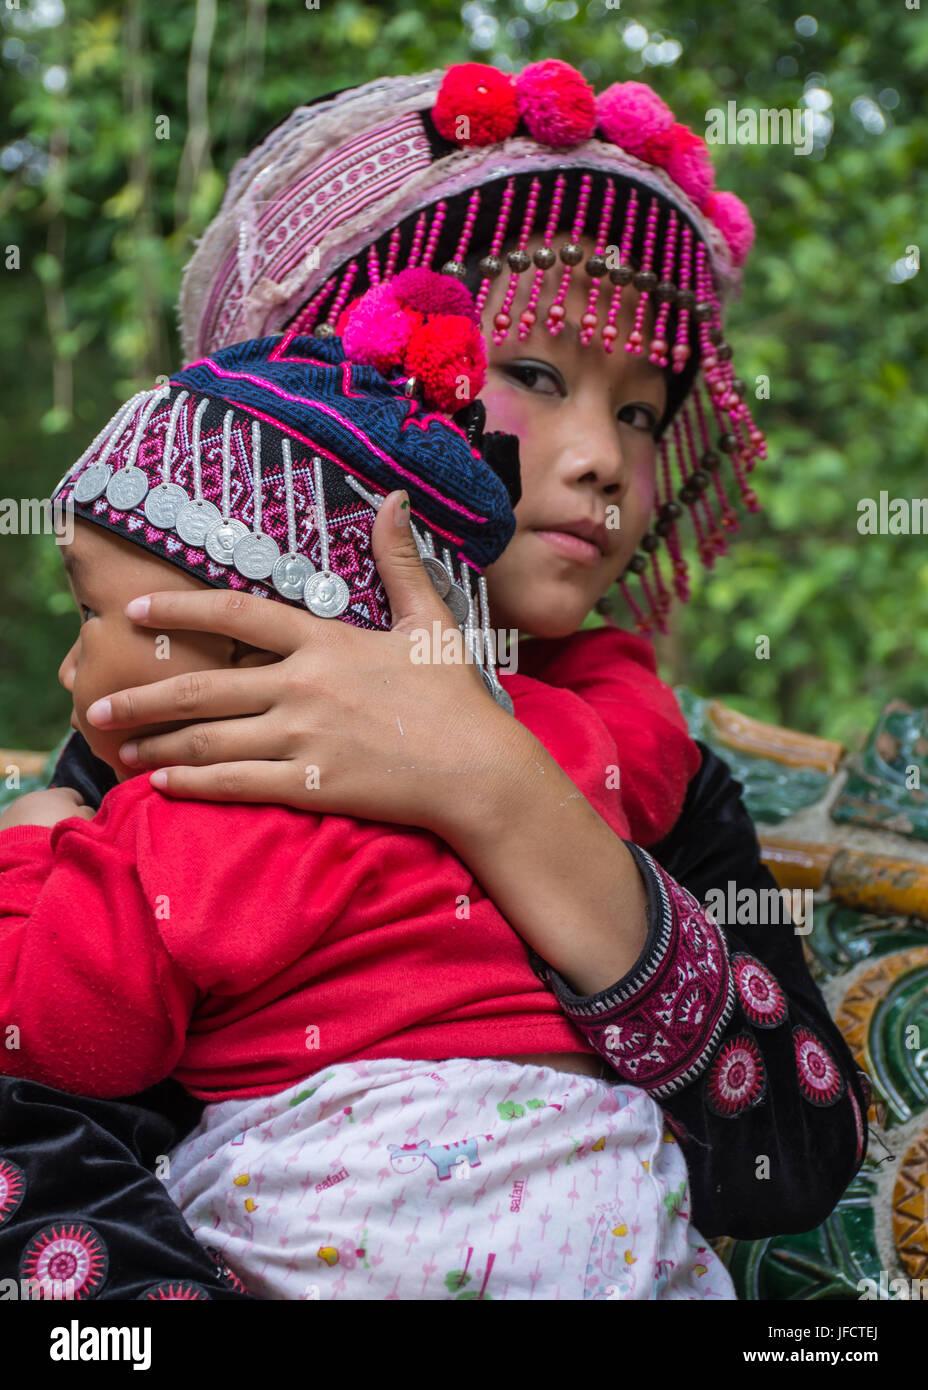 North Hilltribe Children Thailand - Stock Image